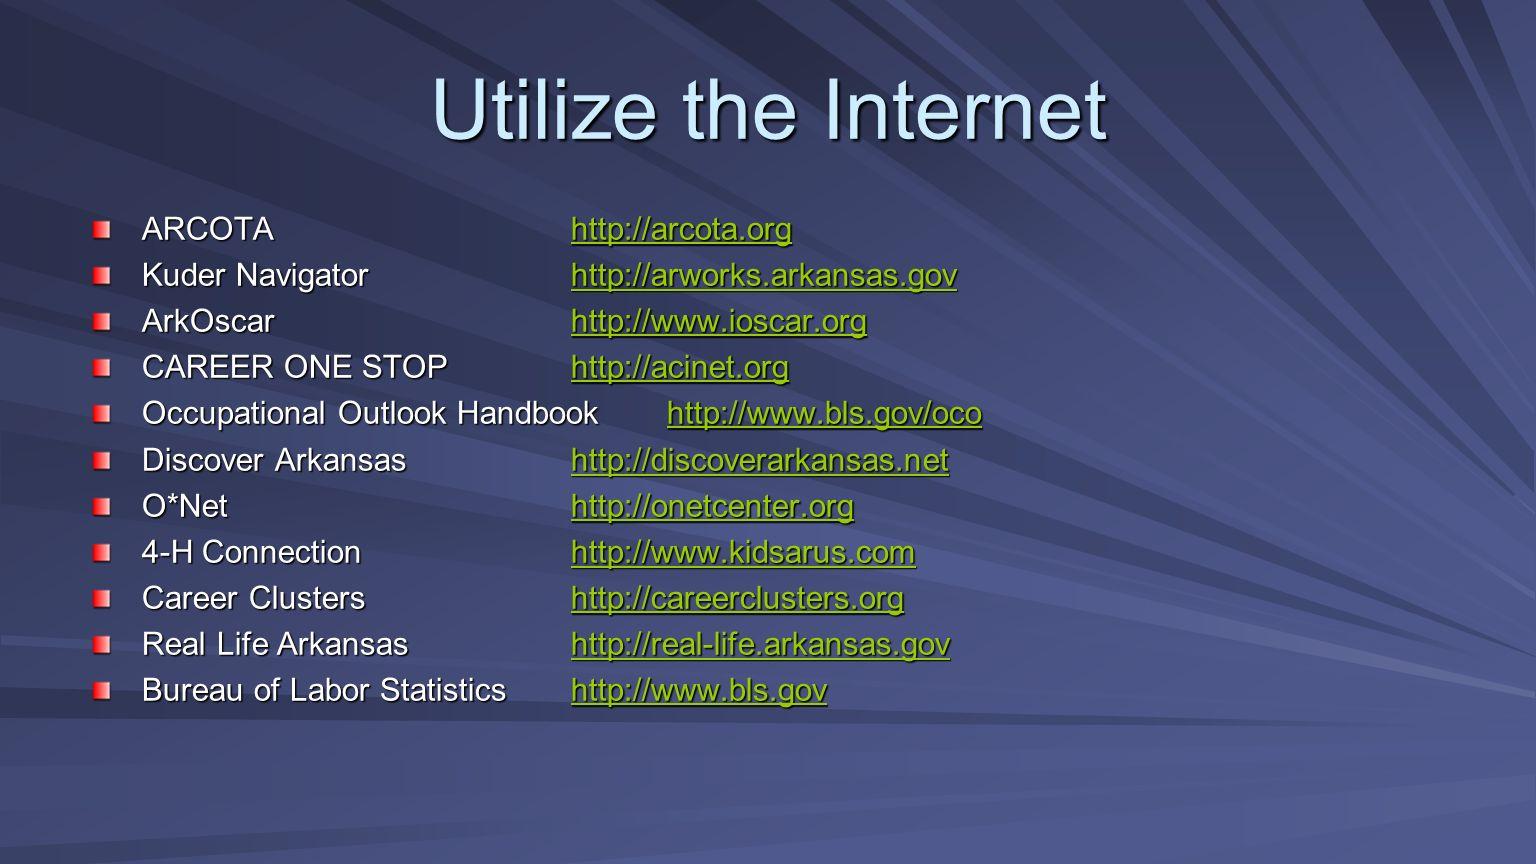 Utilize the Internet ARCOTAhttp://arcota.org http://arcota.org Kuder Navigatorhttp://arworks.arkansas.gov http://arworks.arkansas.gov ArkOscarhttp://www.ioscar.org http://www.ioscar.org CAREER ONE STOPhttp://acinet.org http://acinet.org Occupational Outlook Handbook http://www.bls.gov/oco http://www.bls.gov/oco Discover Arkansashttp://discoverarkansas.net http://discoverarkansas.net O*Nethttp://onetcenter.org http://onetcenter.org 4-H Connectionhttp://www.kidsarus.com http://www.kidsarus.com Career Clustershttp://careerclusters.org http://careerclusters.org Real Life Arkansashttp://real-life.arkansas.gov http://real-life.arkansas.gov Bureau of Labor Statisticshttp://www.bls.gov http://www.bls.gov